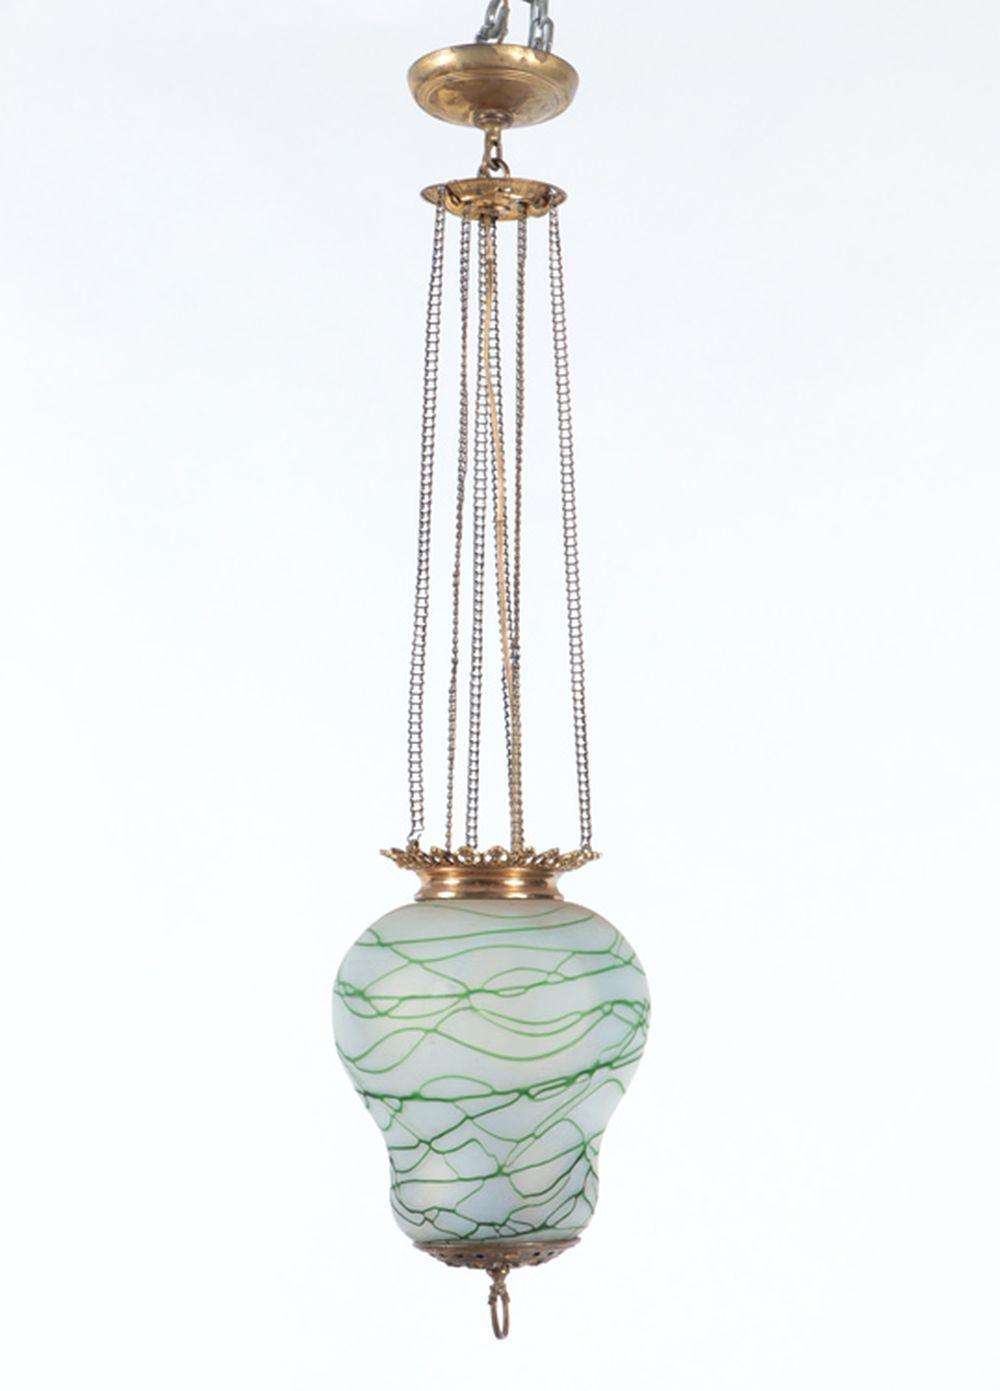 19TH C. HANGING OIL LAMP ART GLASS SHADE